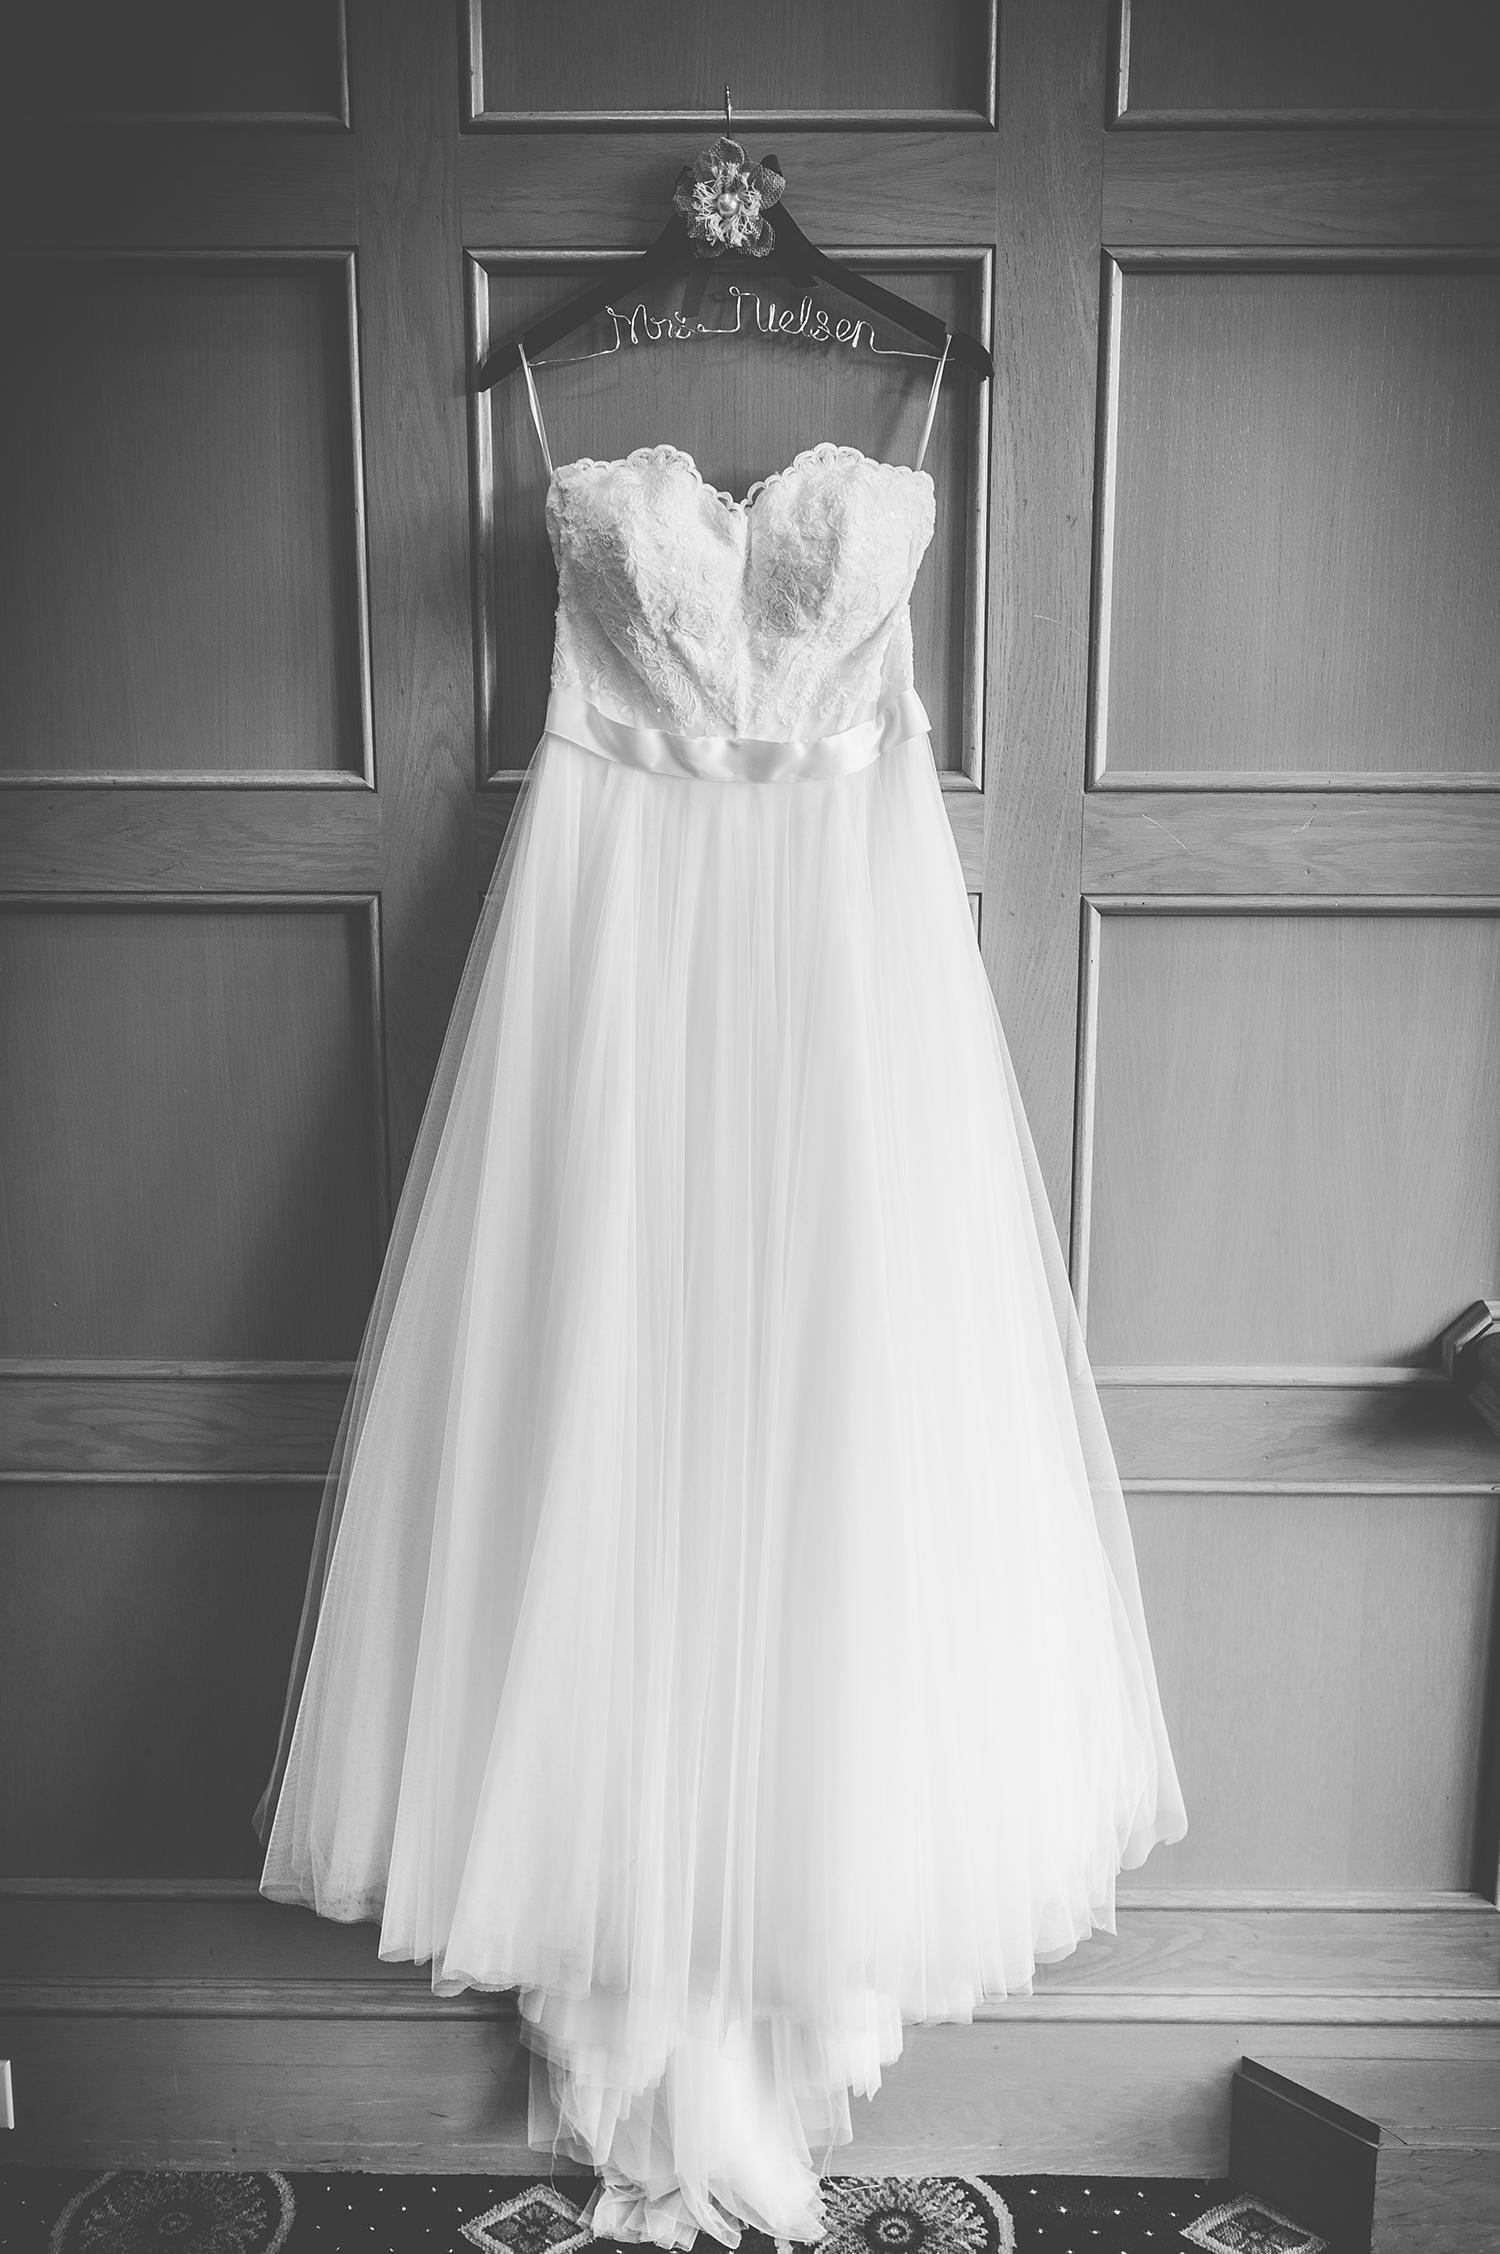 wedding-Sarah-John-Getting-Ready-Details-0051.jpg